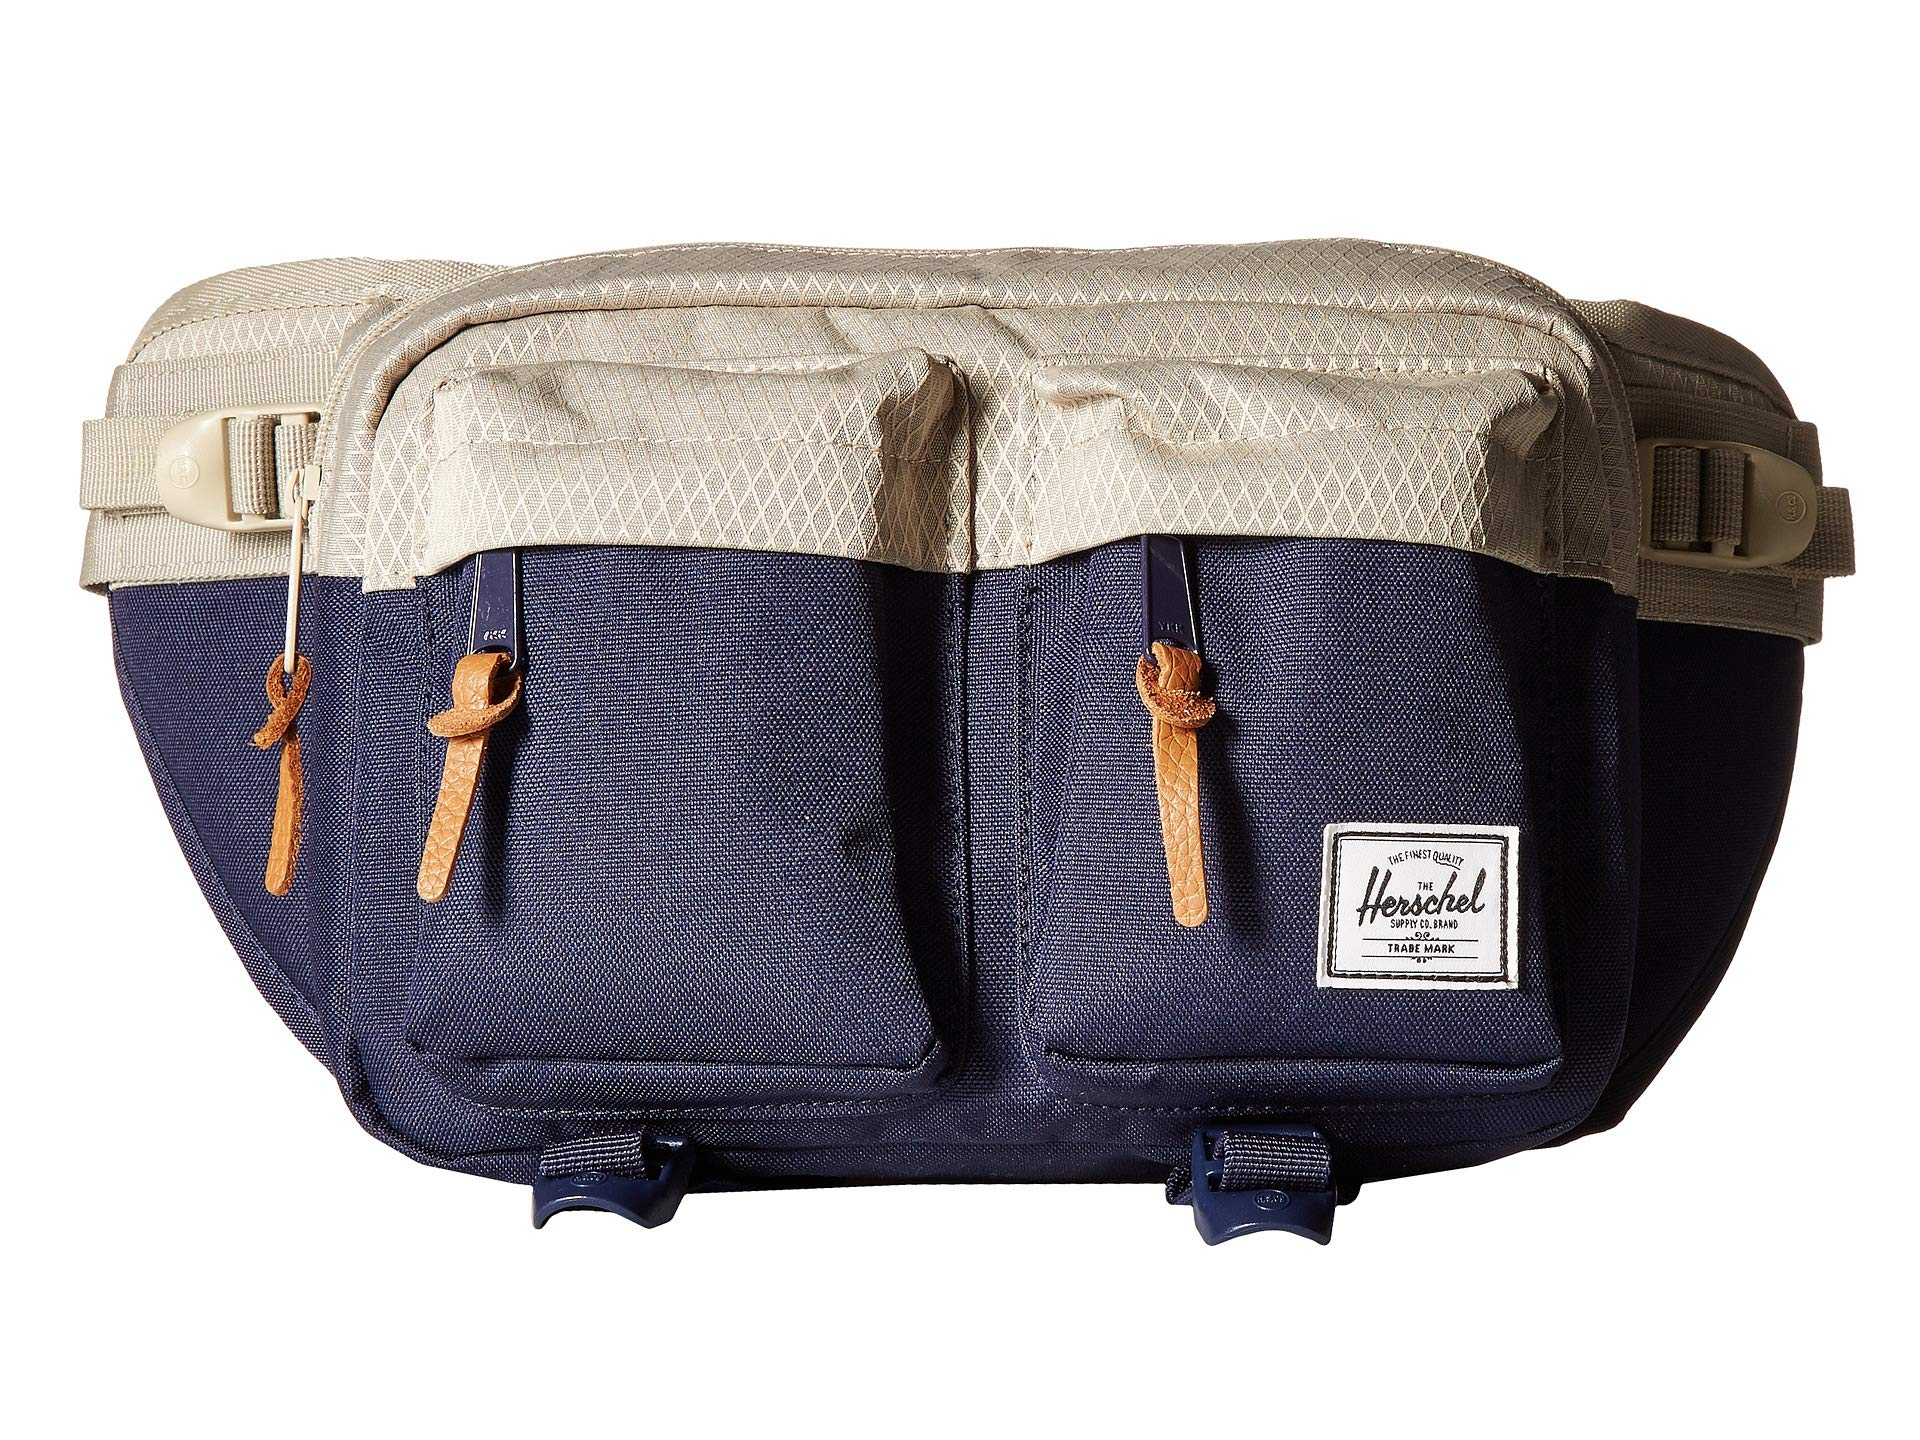 Herschel Supply Co. Eighteen Waist Pack, Peacoat/Eucalyptus, One Size